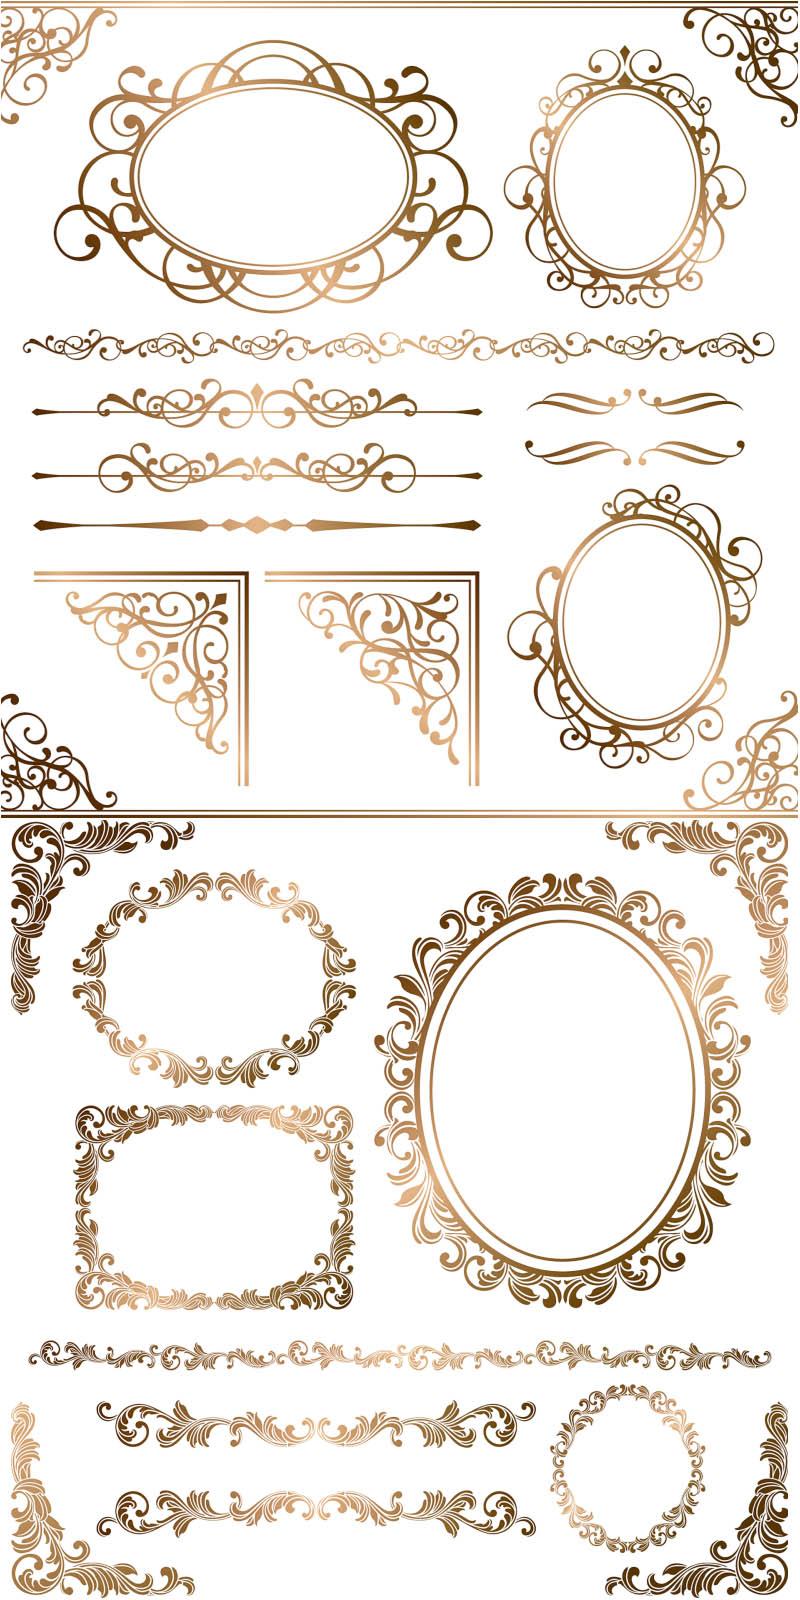 free vector clipart frames - photo #41